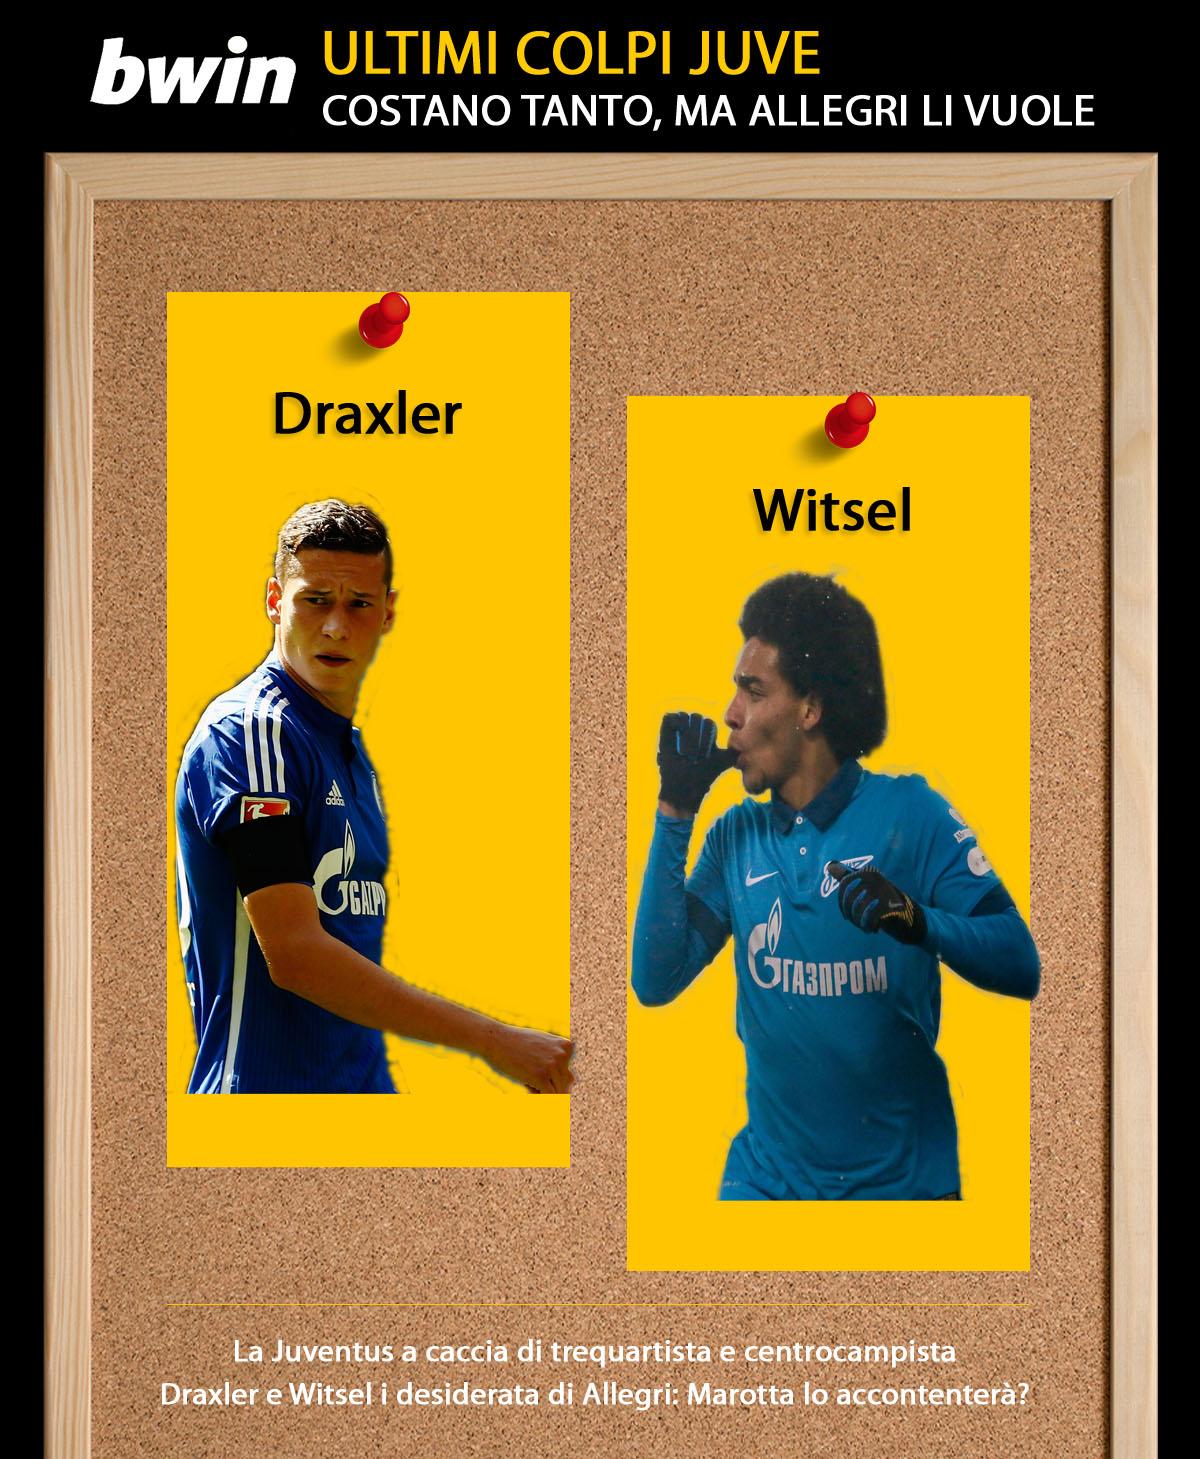 Infografica Draxler-Witsel Juve